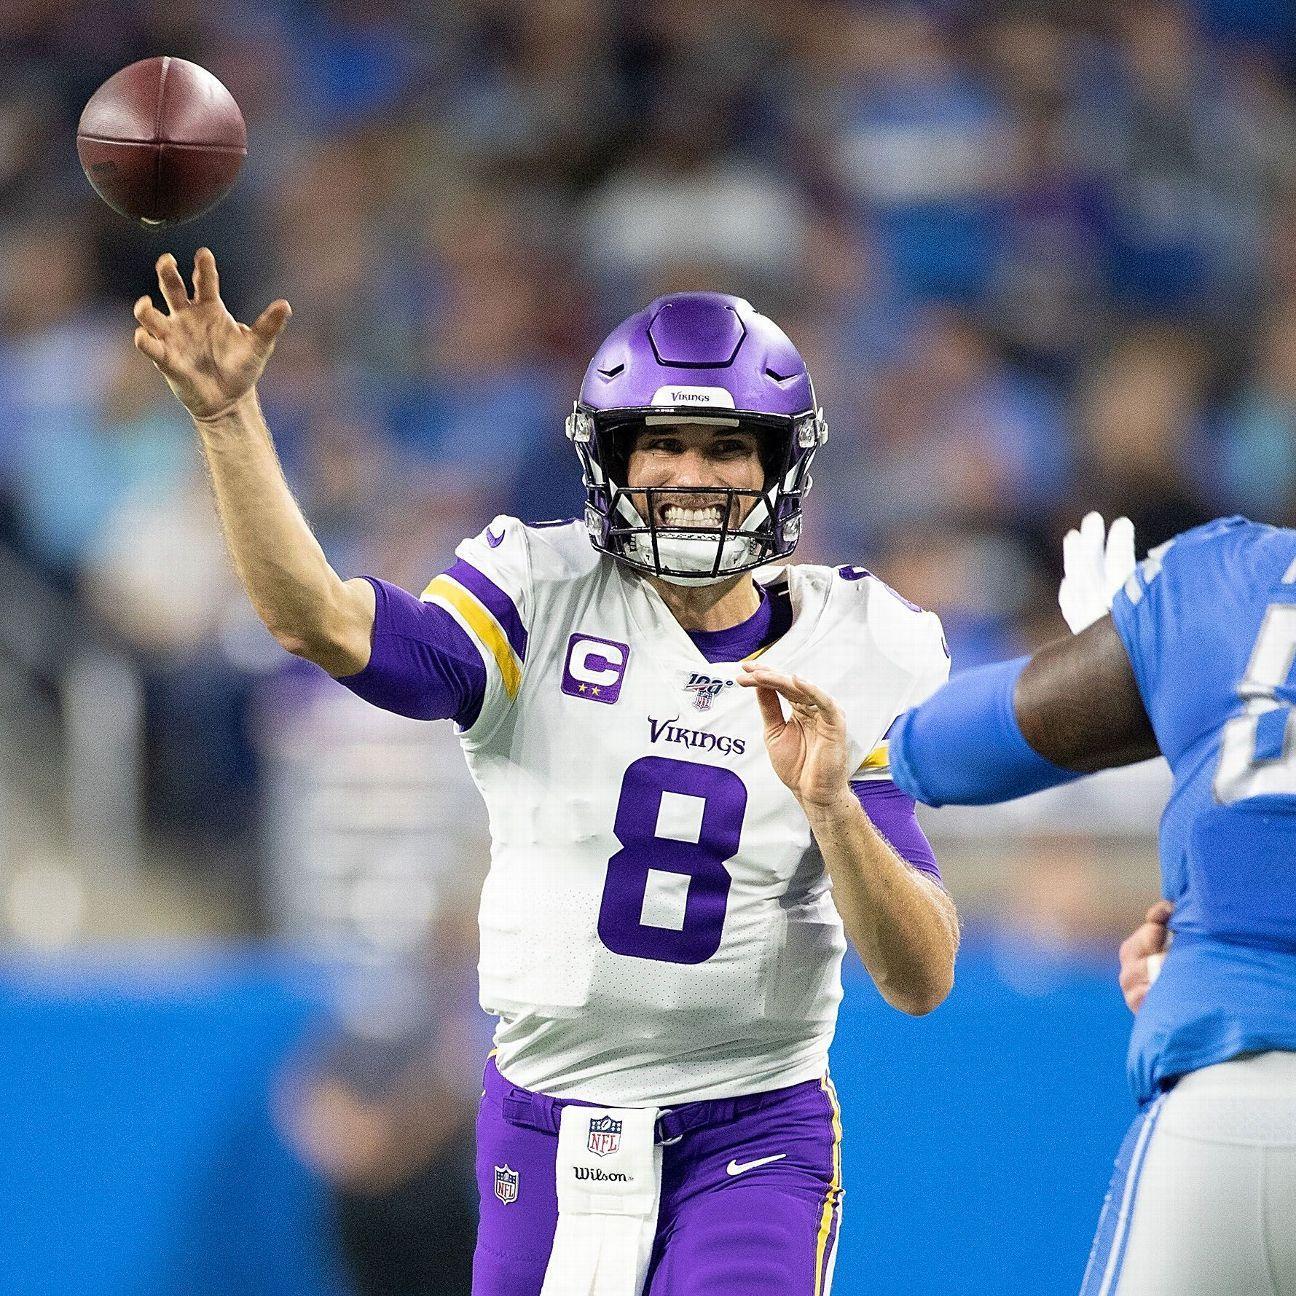 nfl quarterback rankings 2019 2020 season - HD1296×1296